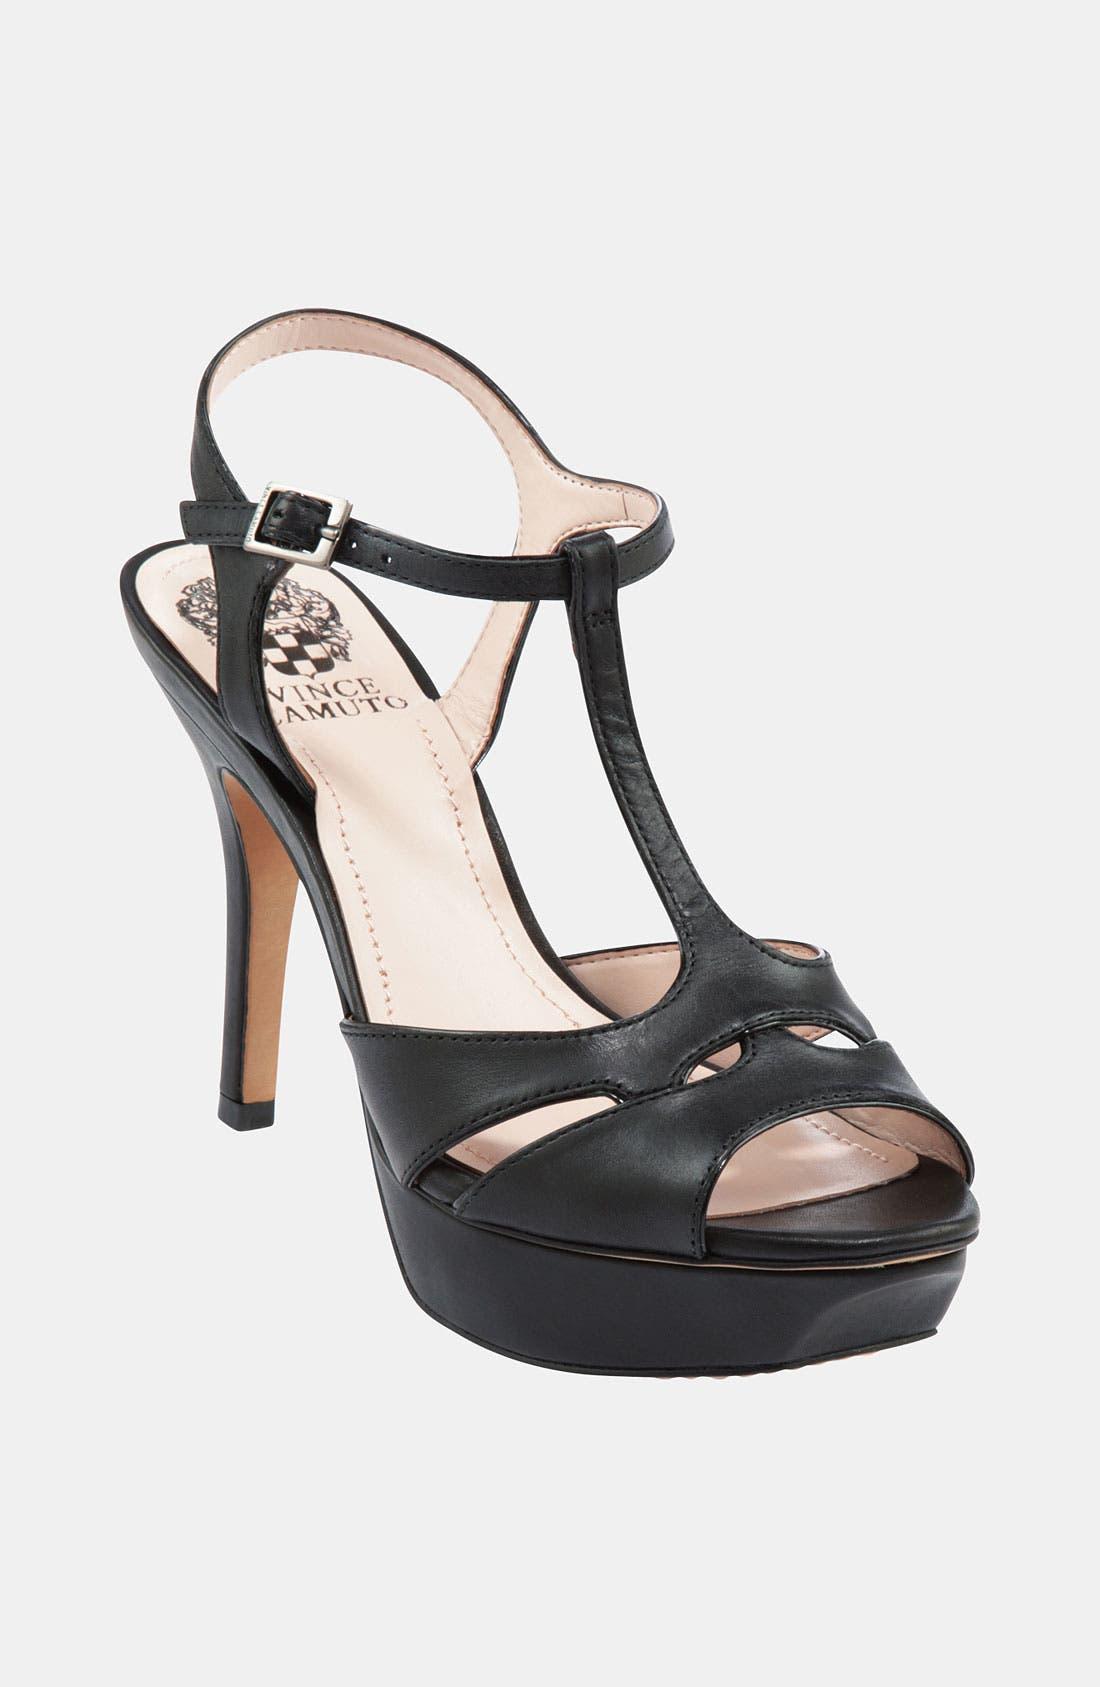 Alternate Image 1 Selected - Vince Camuto 'Trinna' Sandal (Online Only)